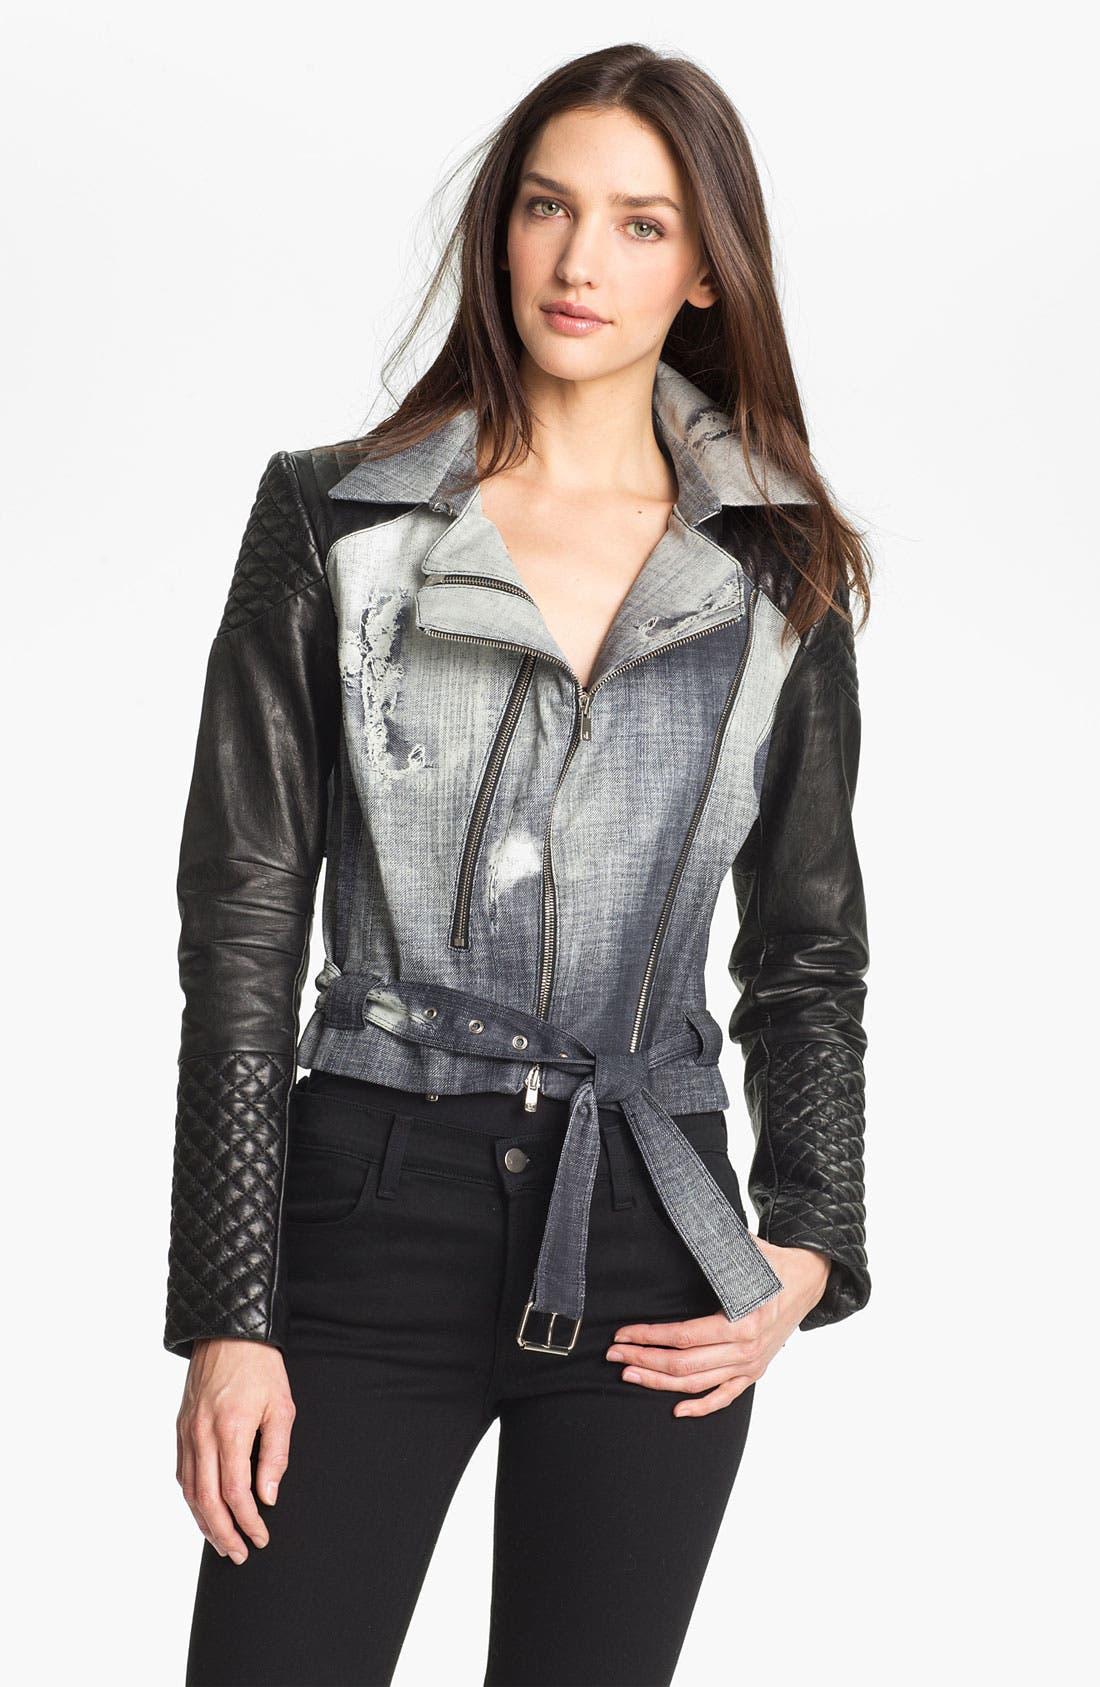 Main Image - Rebecca Minkoff 'Kiefer' Leather Sleeve Biker Jacket